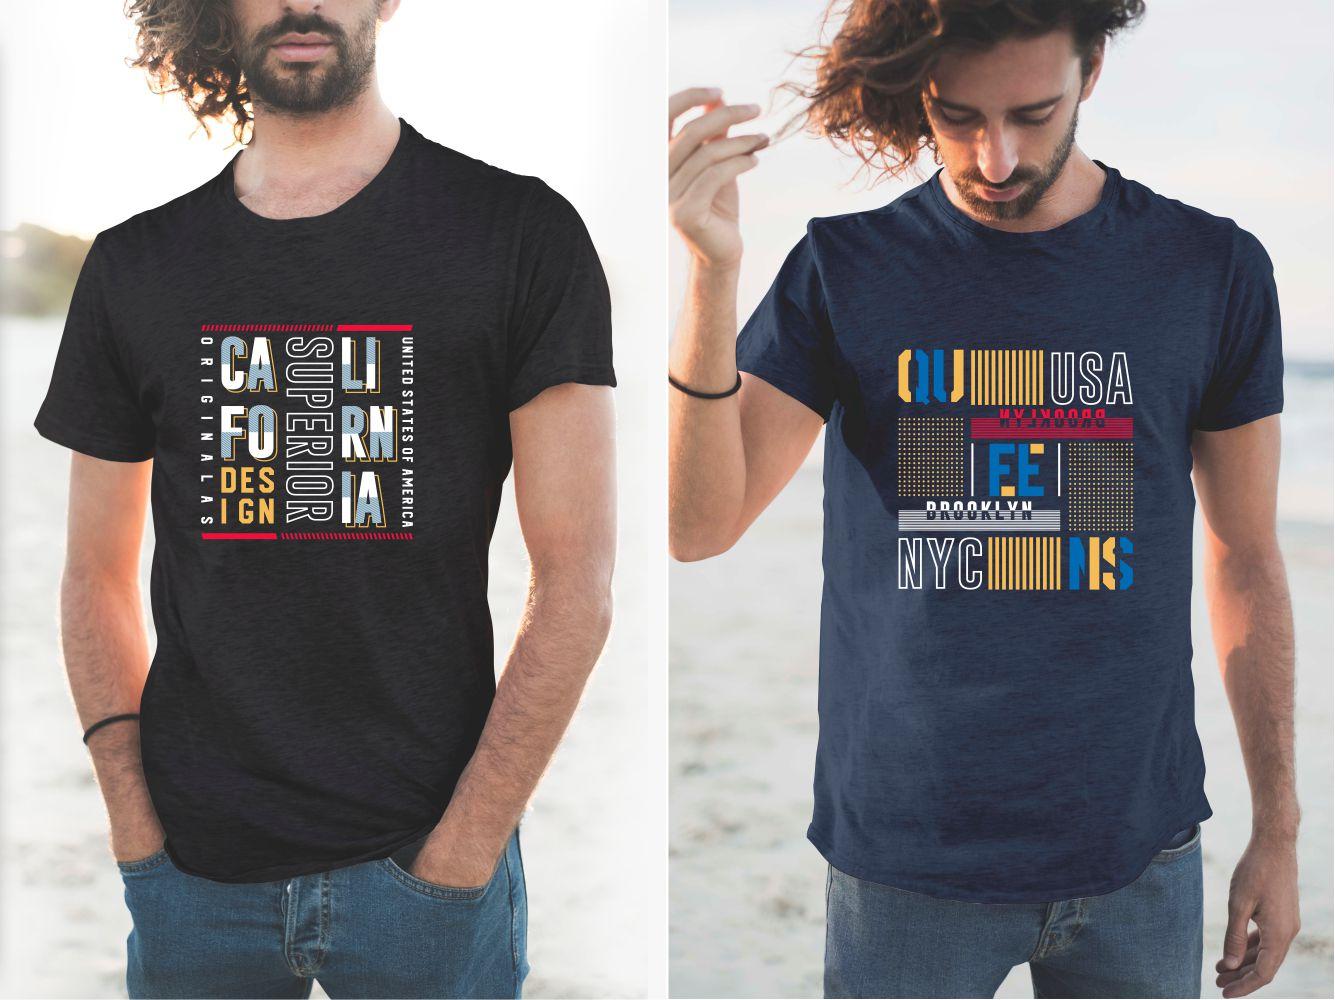 106 Urban T-shirt Designs Collection - 21 1